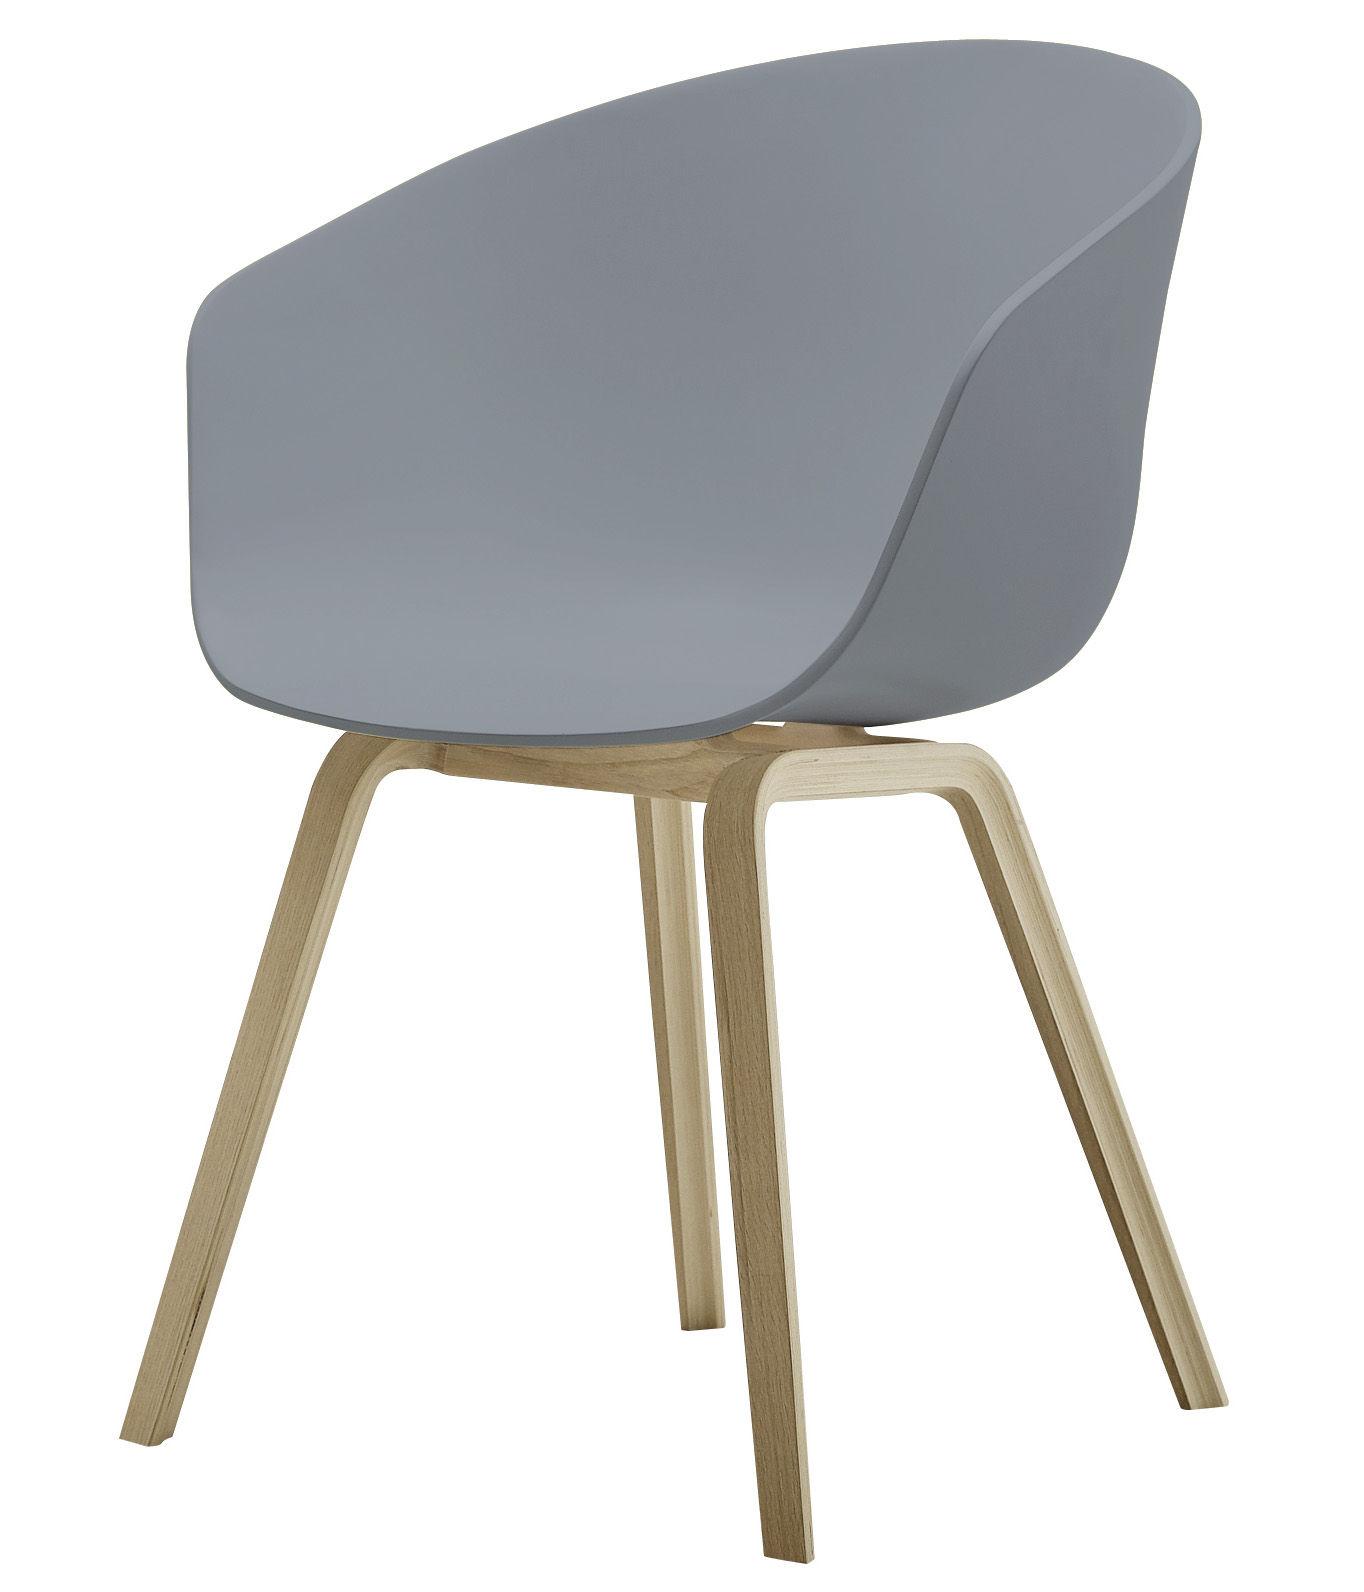 Möbel - Stühle  - About a chair AAC 22 Sessel - 4 Füße - Hay - Grau / Gestell Holz natur - Chêne savonné, Polypropylen